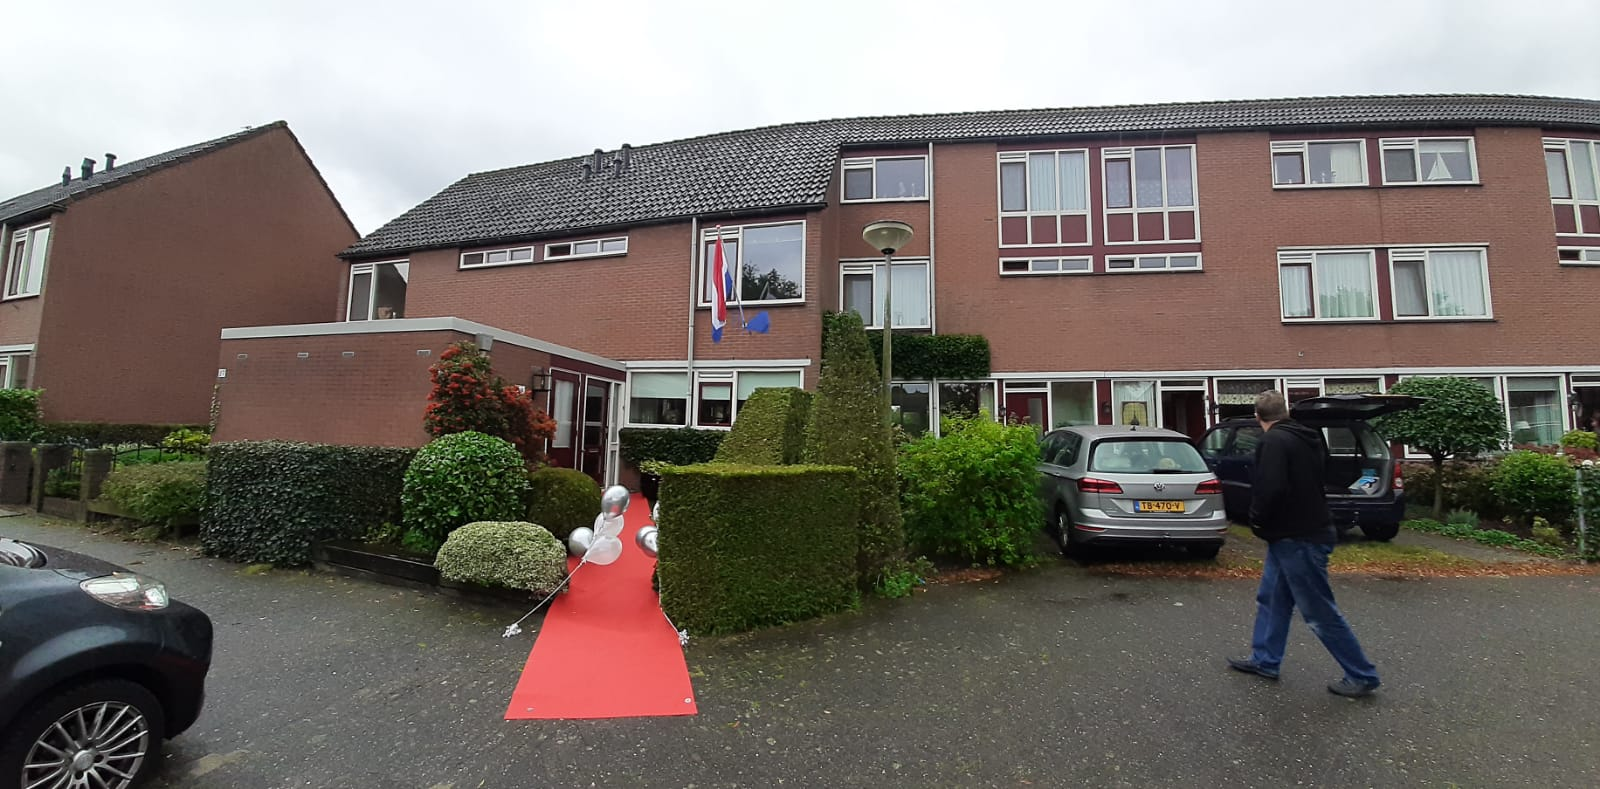 Rode loper vanaf 1 meter gebruik: Rode loper vanaf 1 meter